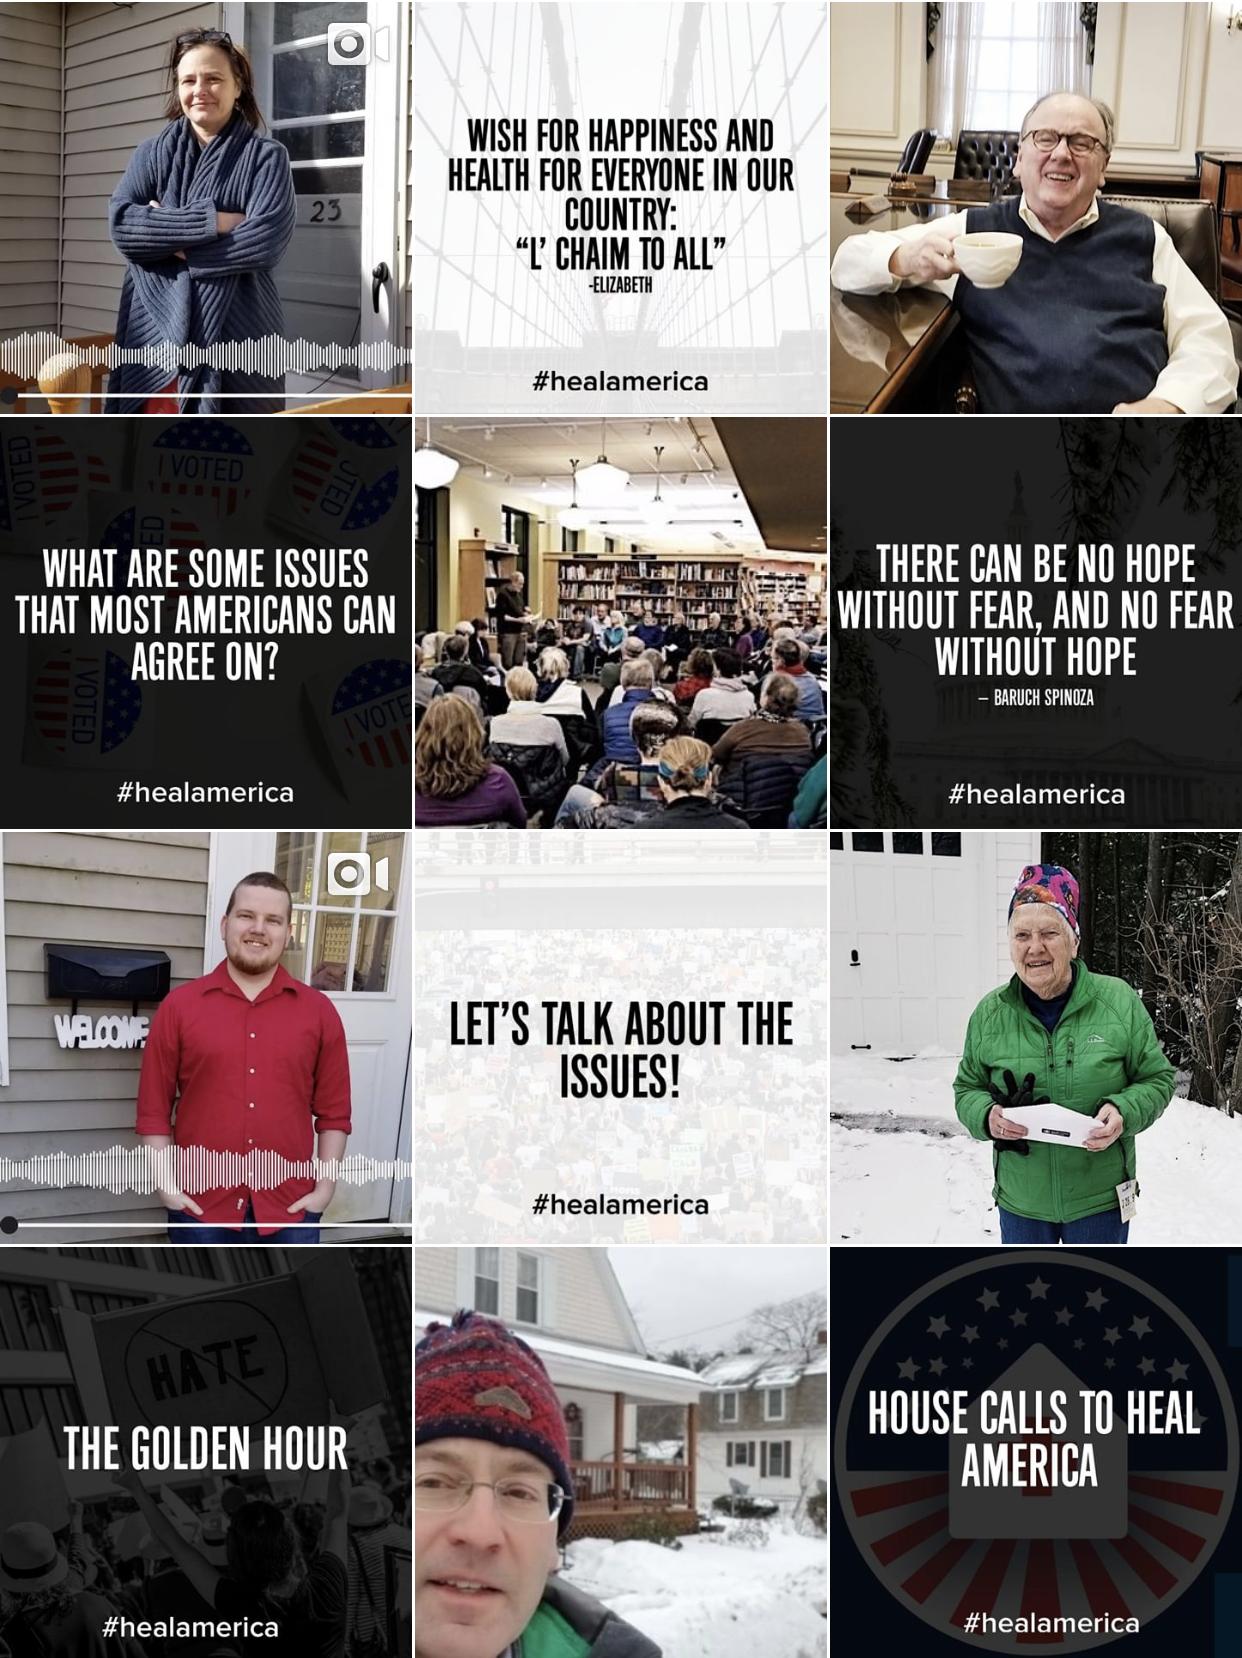 House Calls to Heal America - Instagram: @housecallstohealamericaTwitter: @housecallshealFacebook: House Calls to Heal AmericaLinkedIn: House Calls to  Heal America